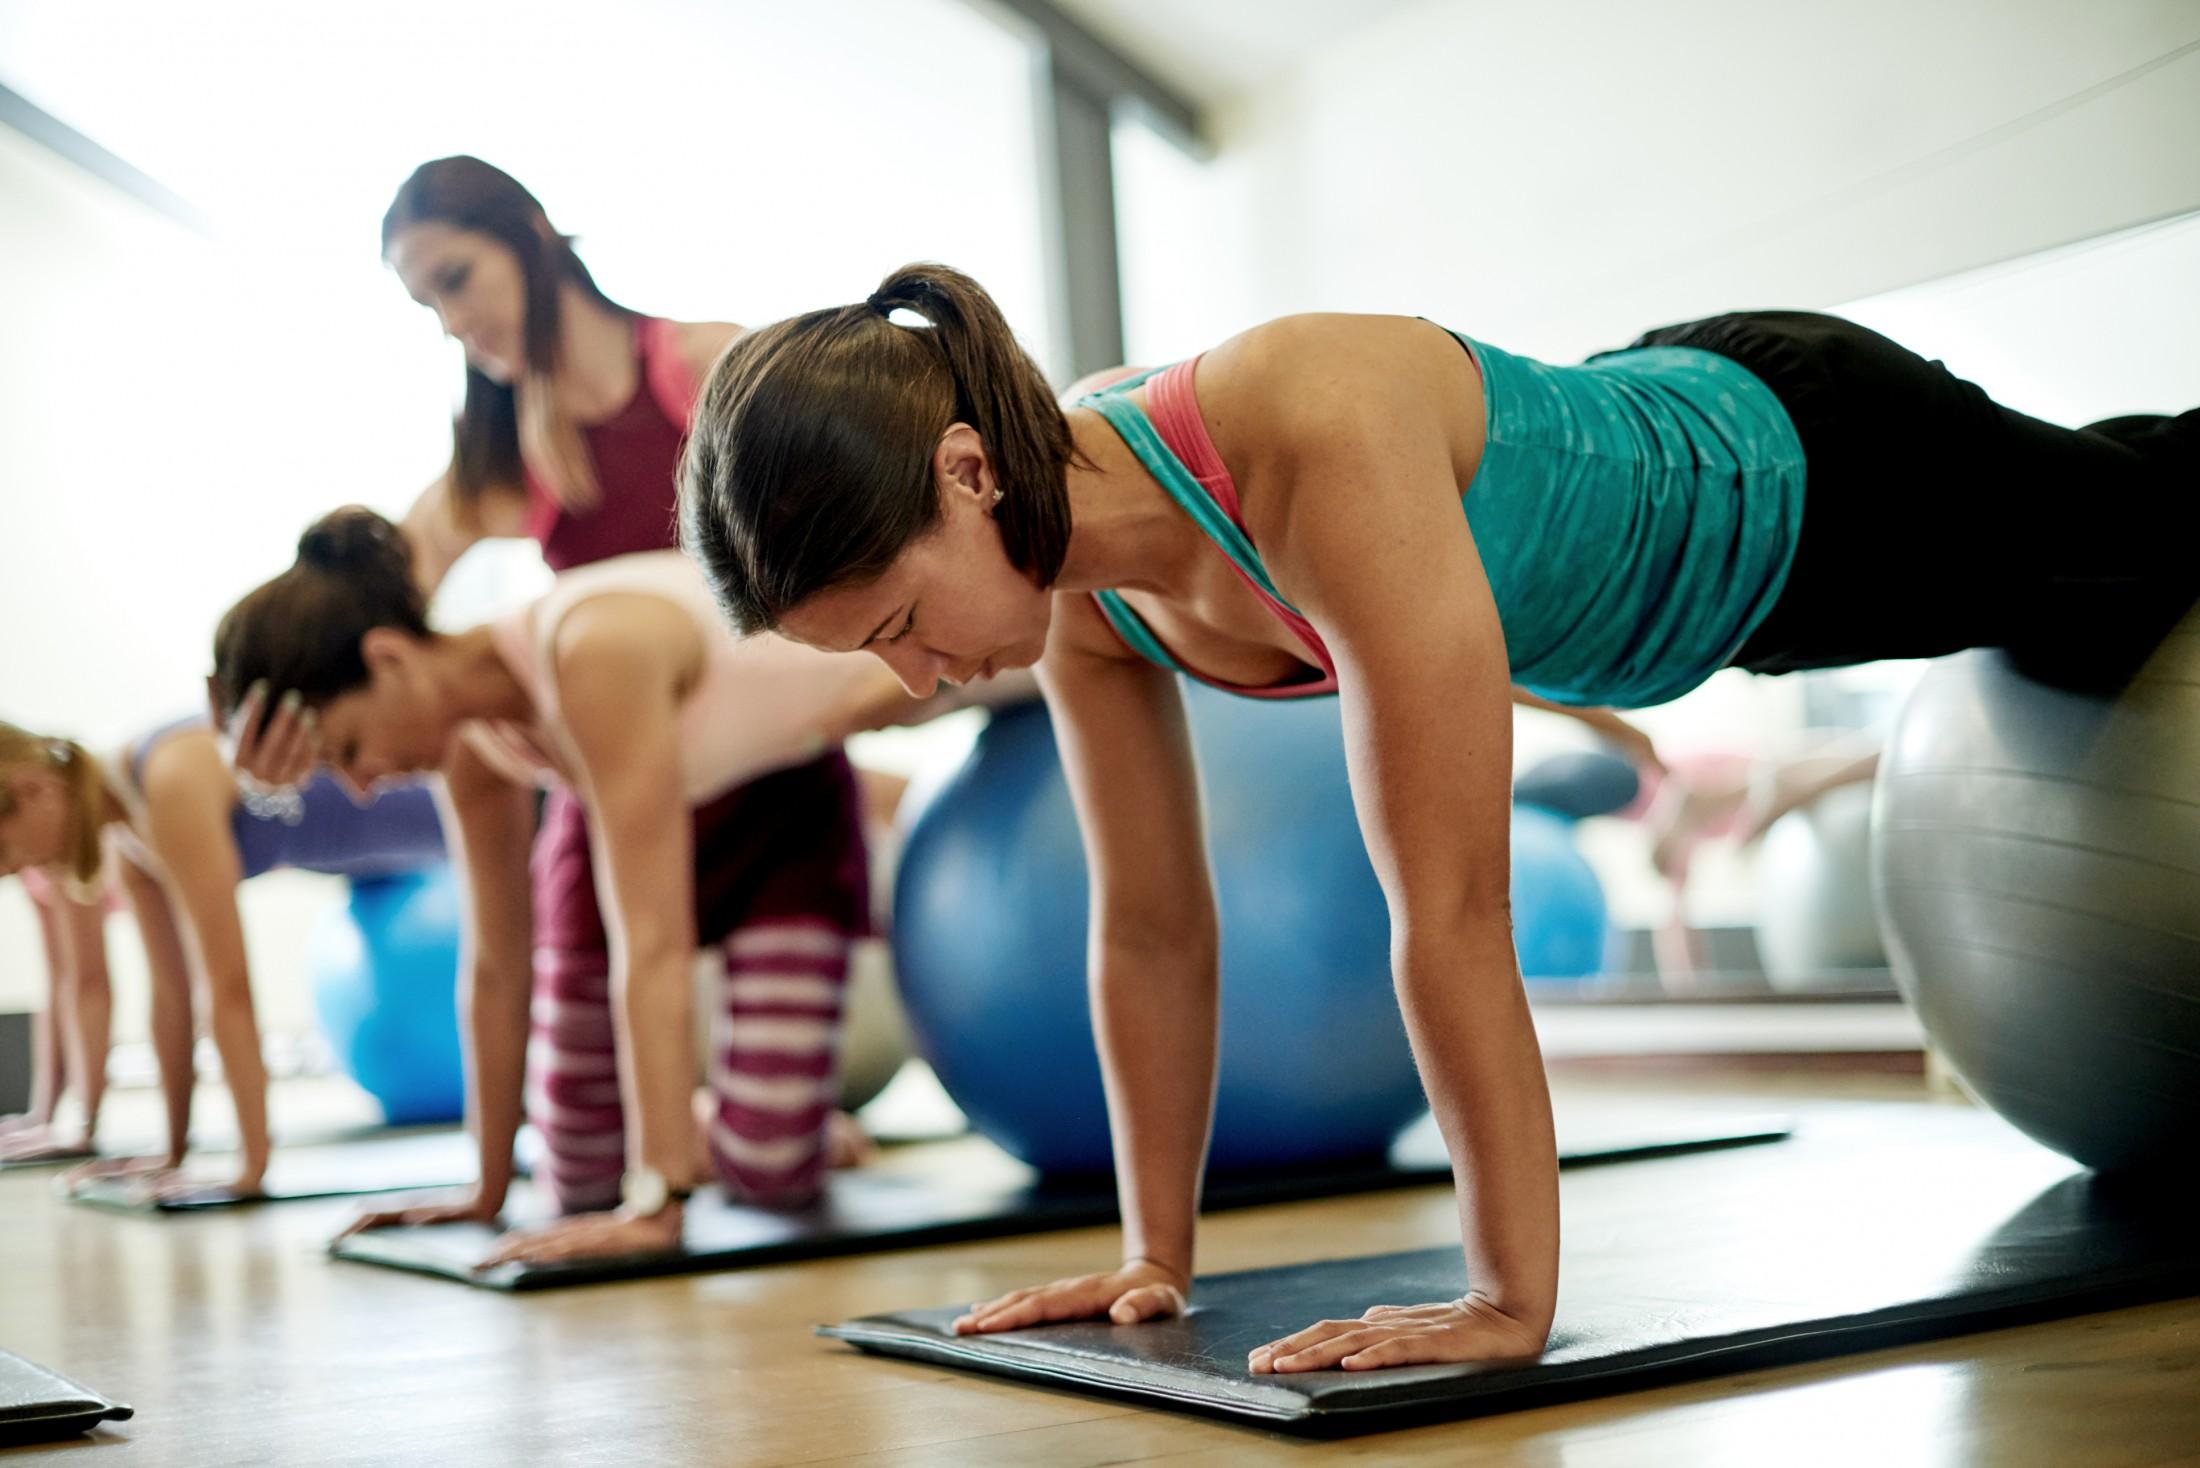 Restplätze Health & Fitness